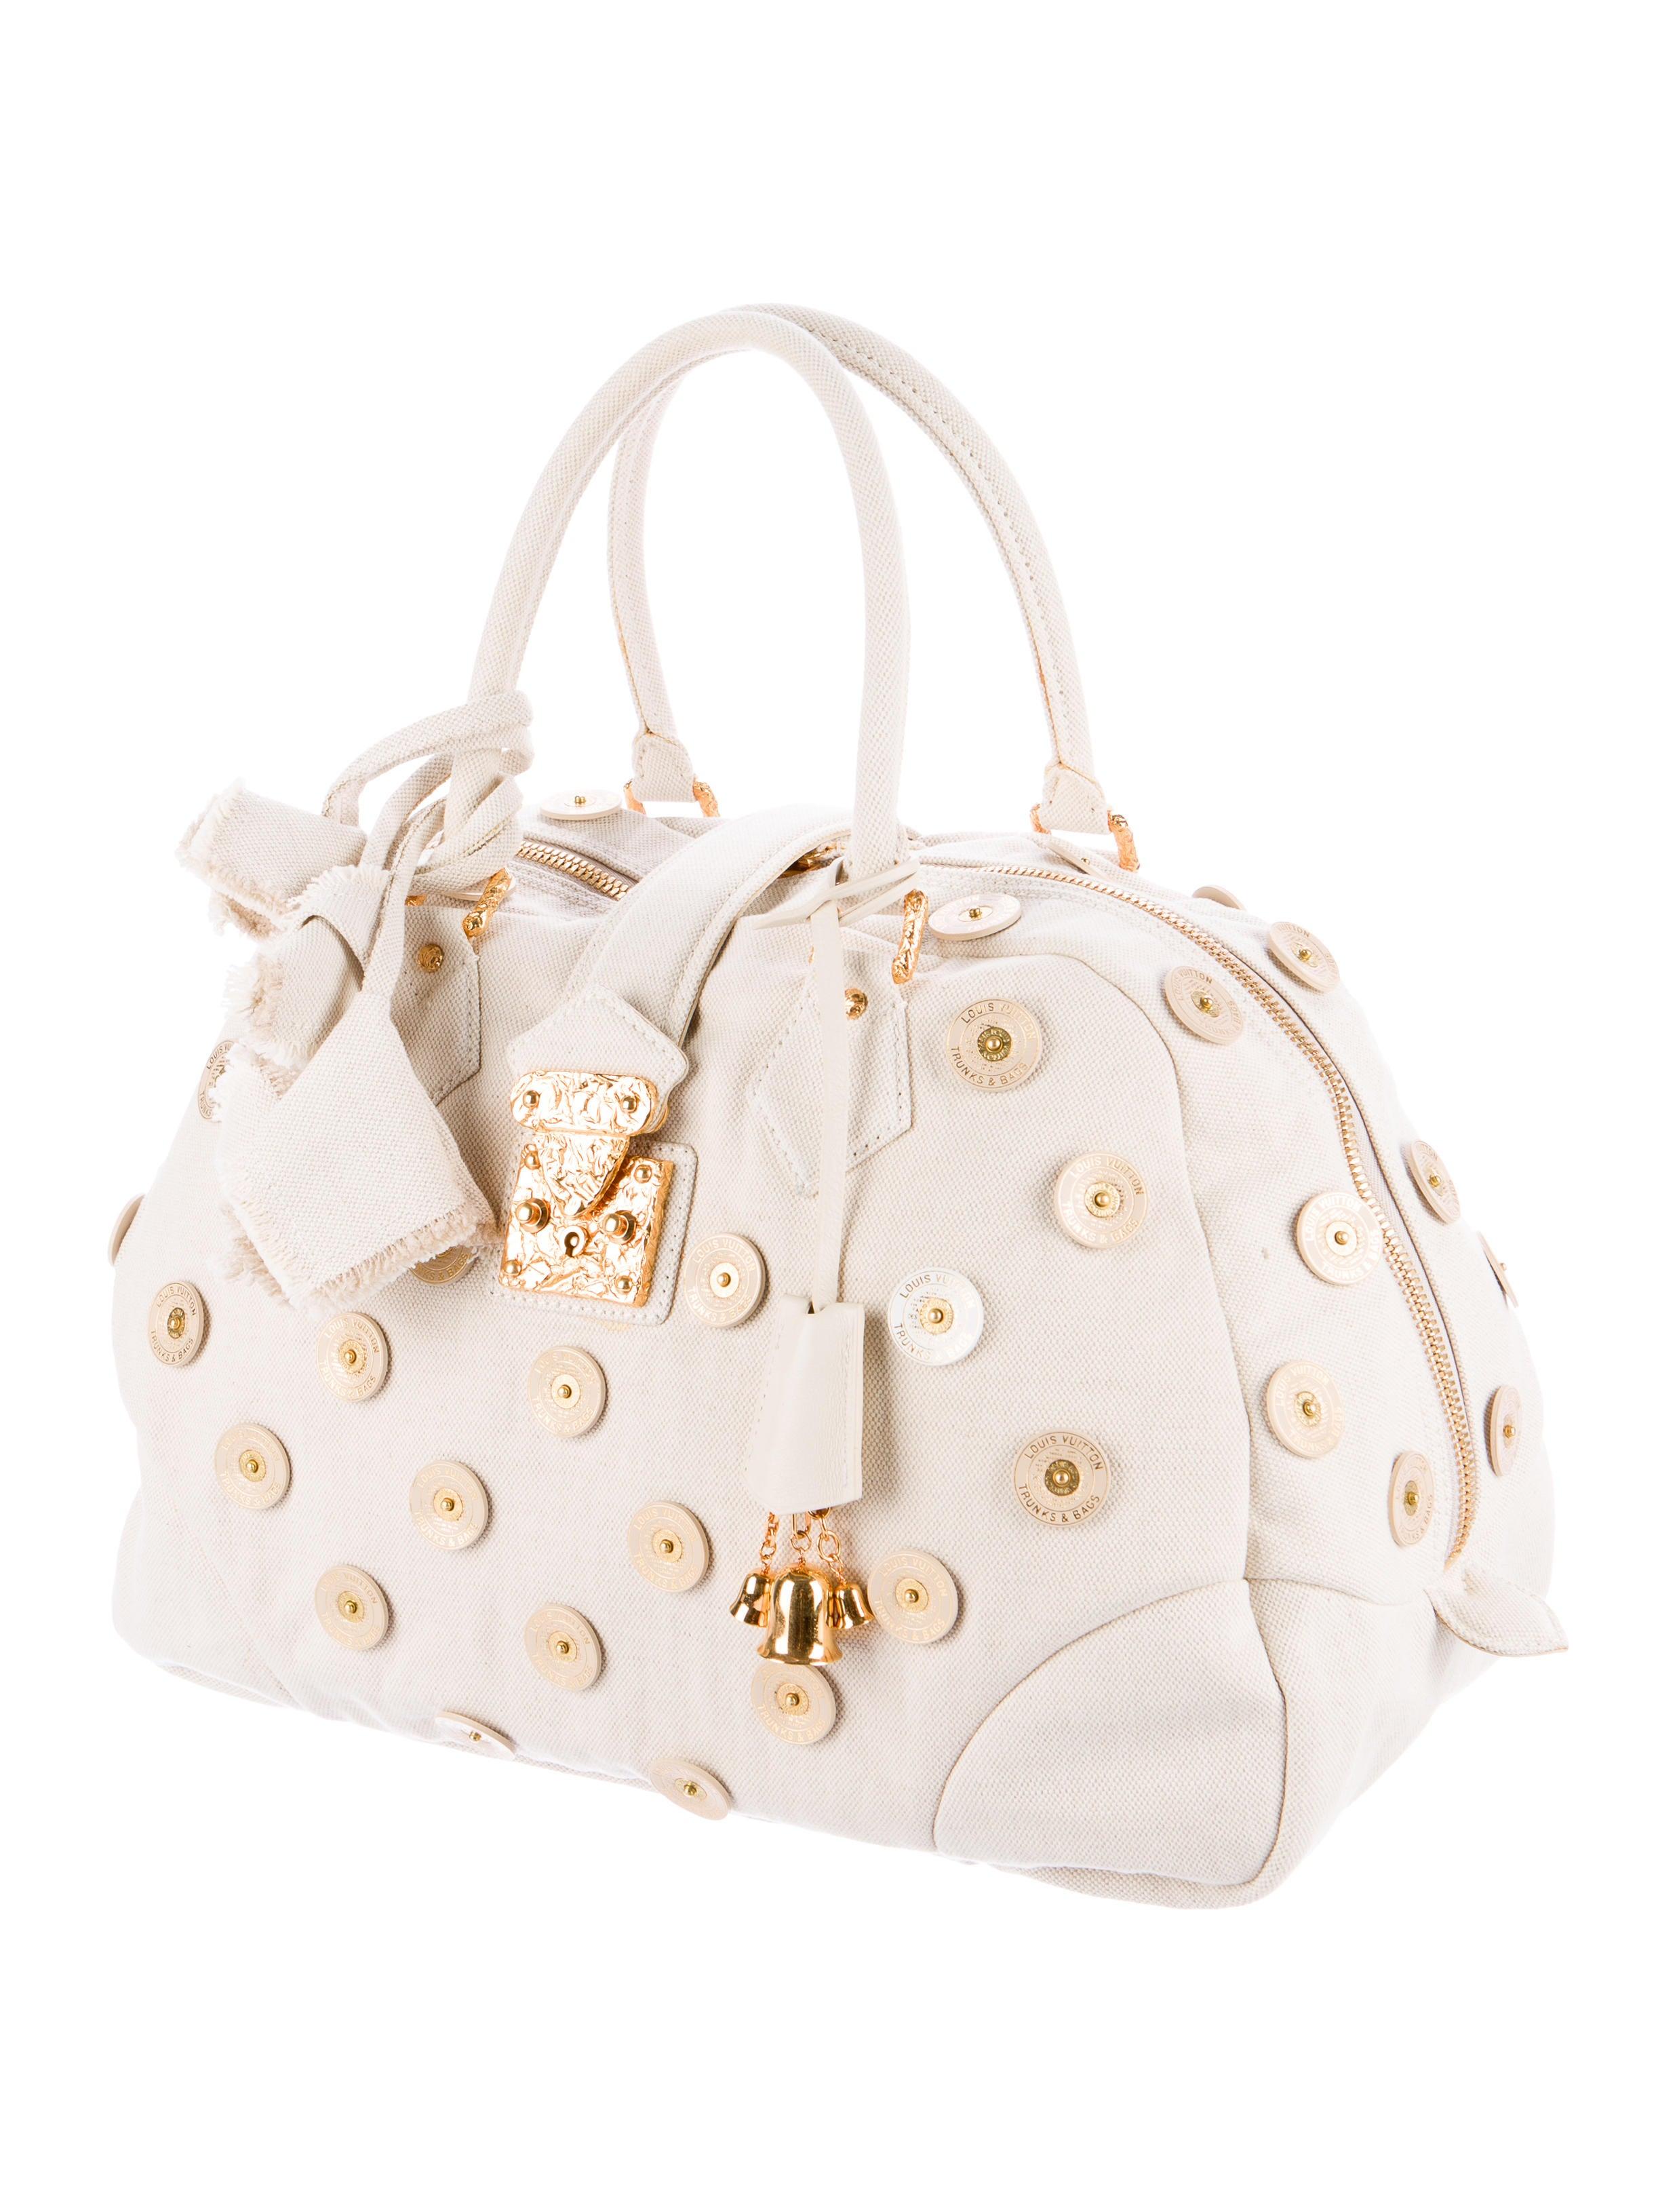 Louis Vuitton Bowly Polka Dot Panama Bag - Handbags